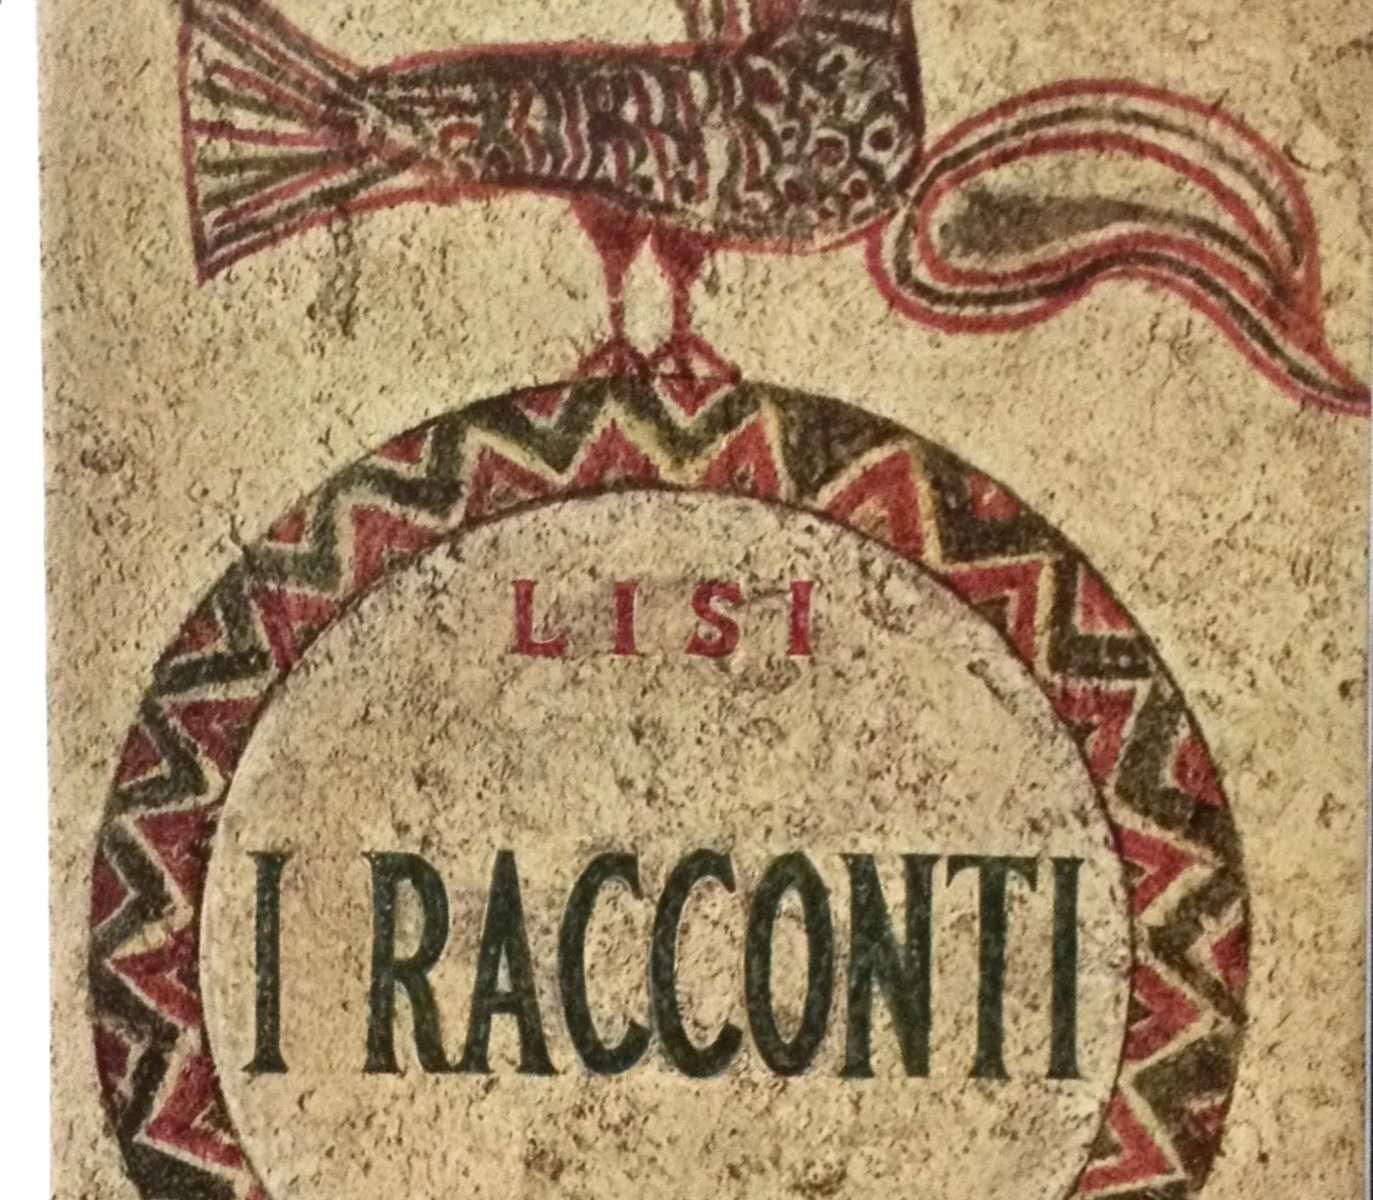 I RACCONTI  <BR/>Nicola Lisi